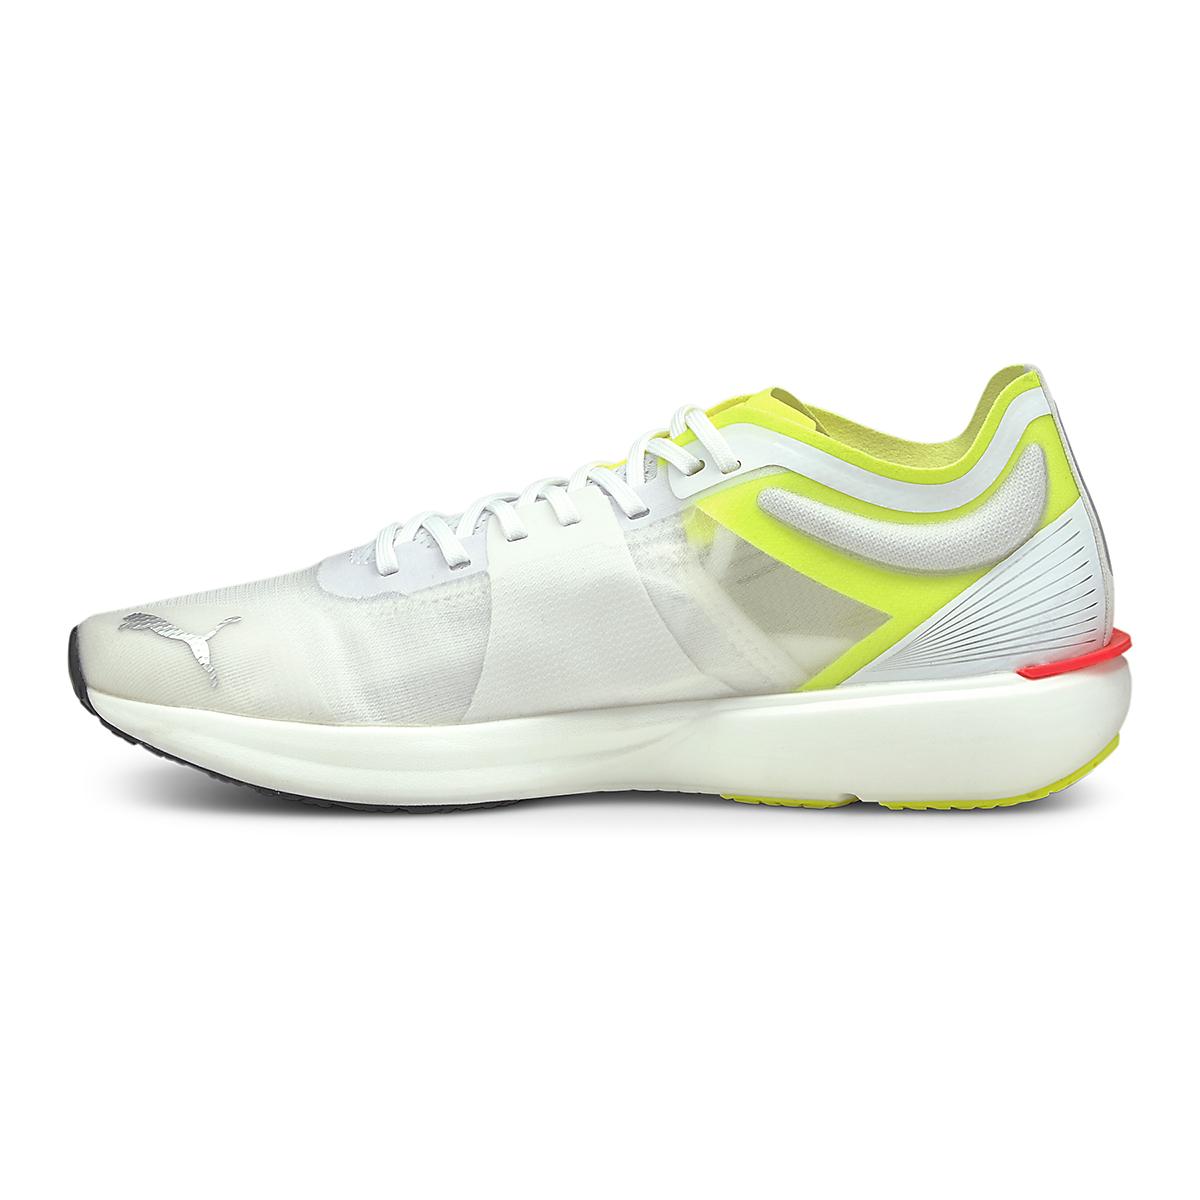 Men's Puma Liberate Nitro Running Shoe - Color: Puma White-Yellow Alert - Size: 7 - Width: Regular, Puma White-Yellow Alert, large, image 2